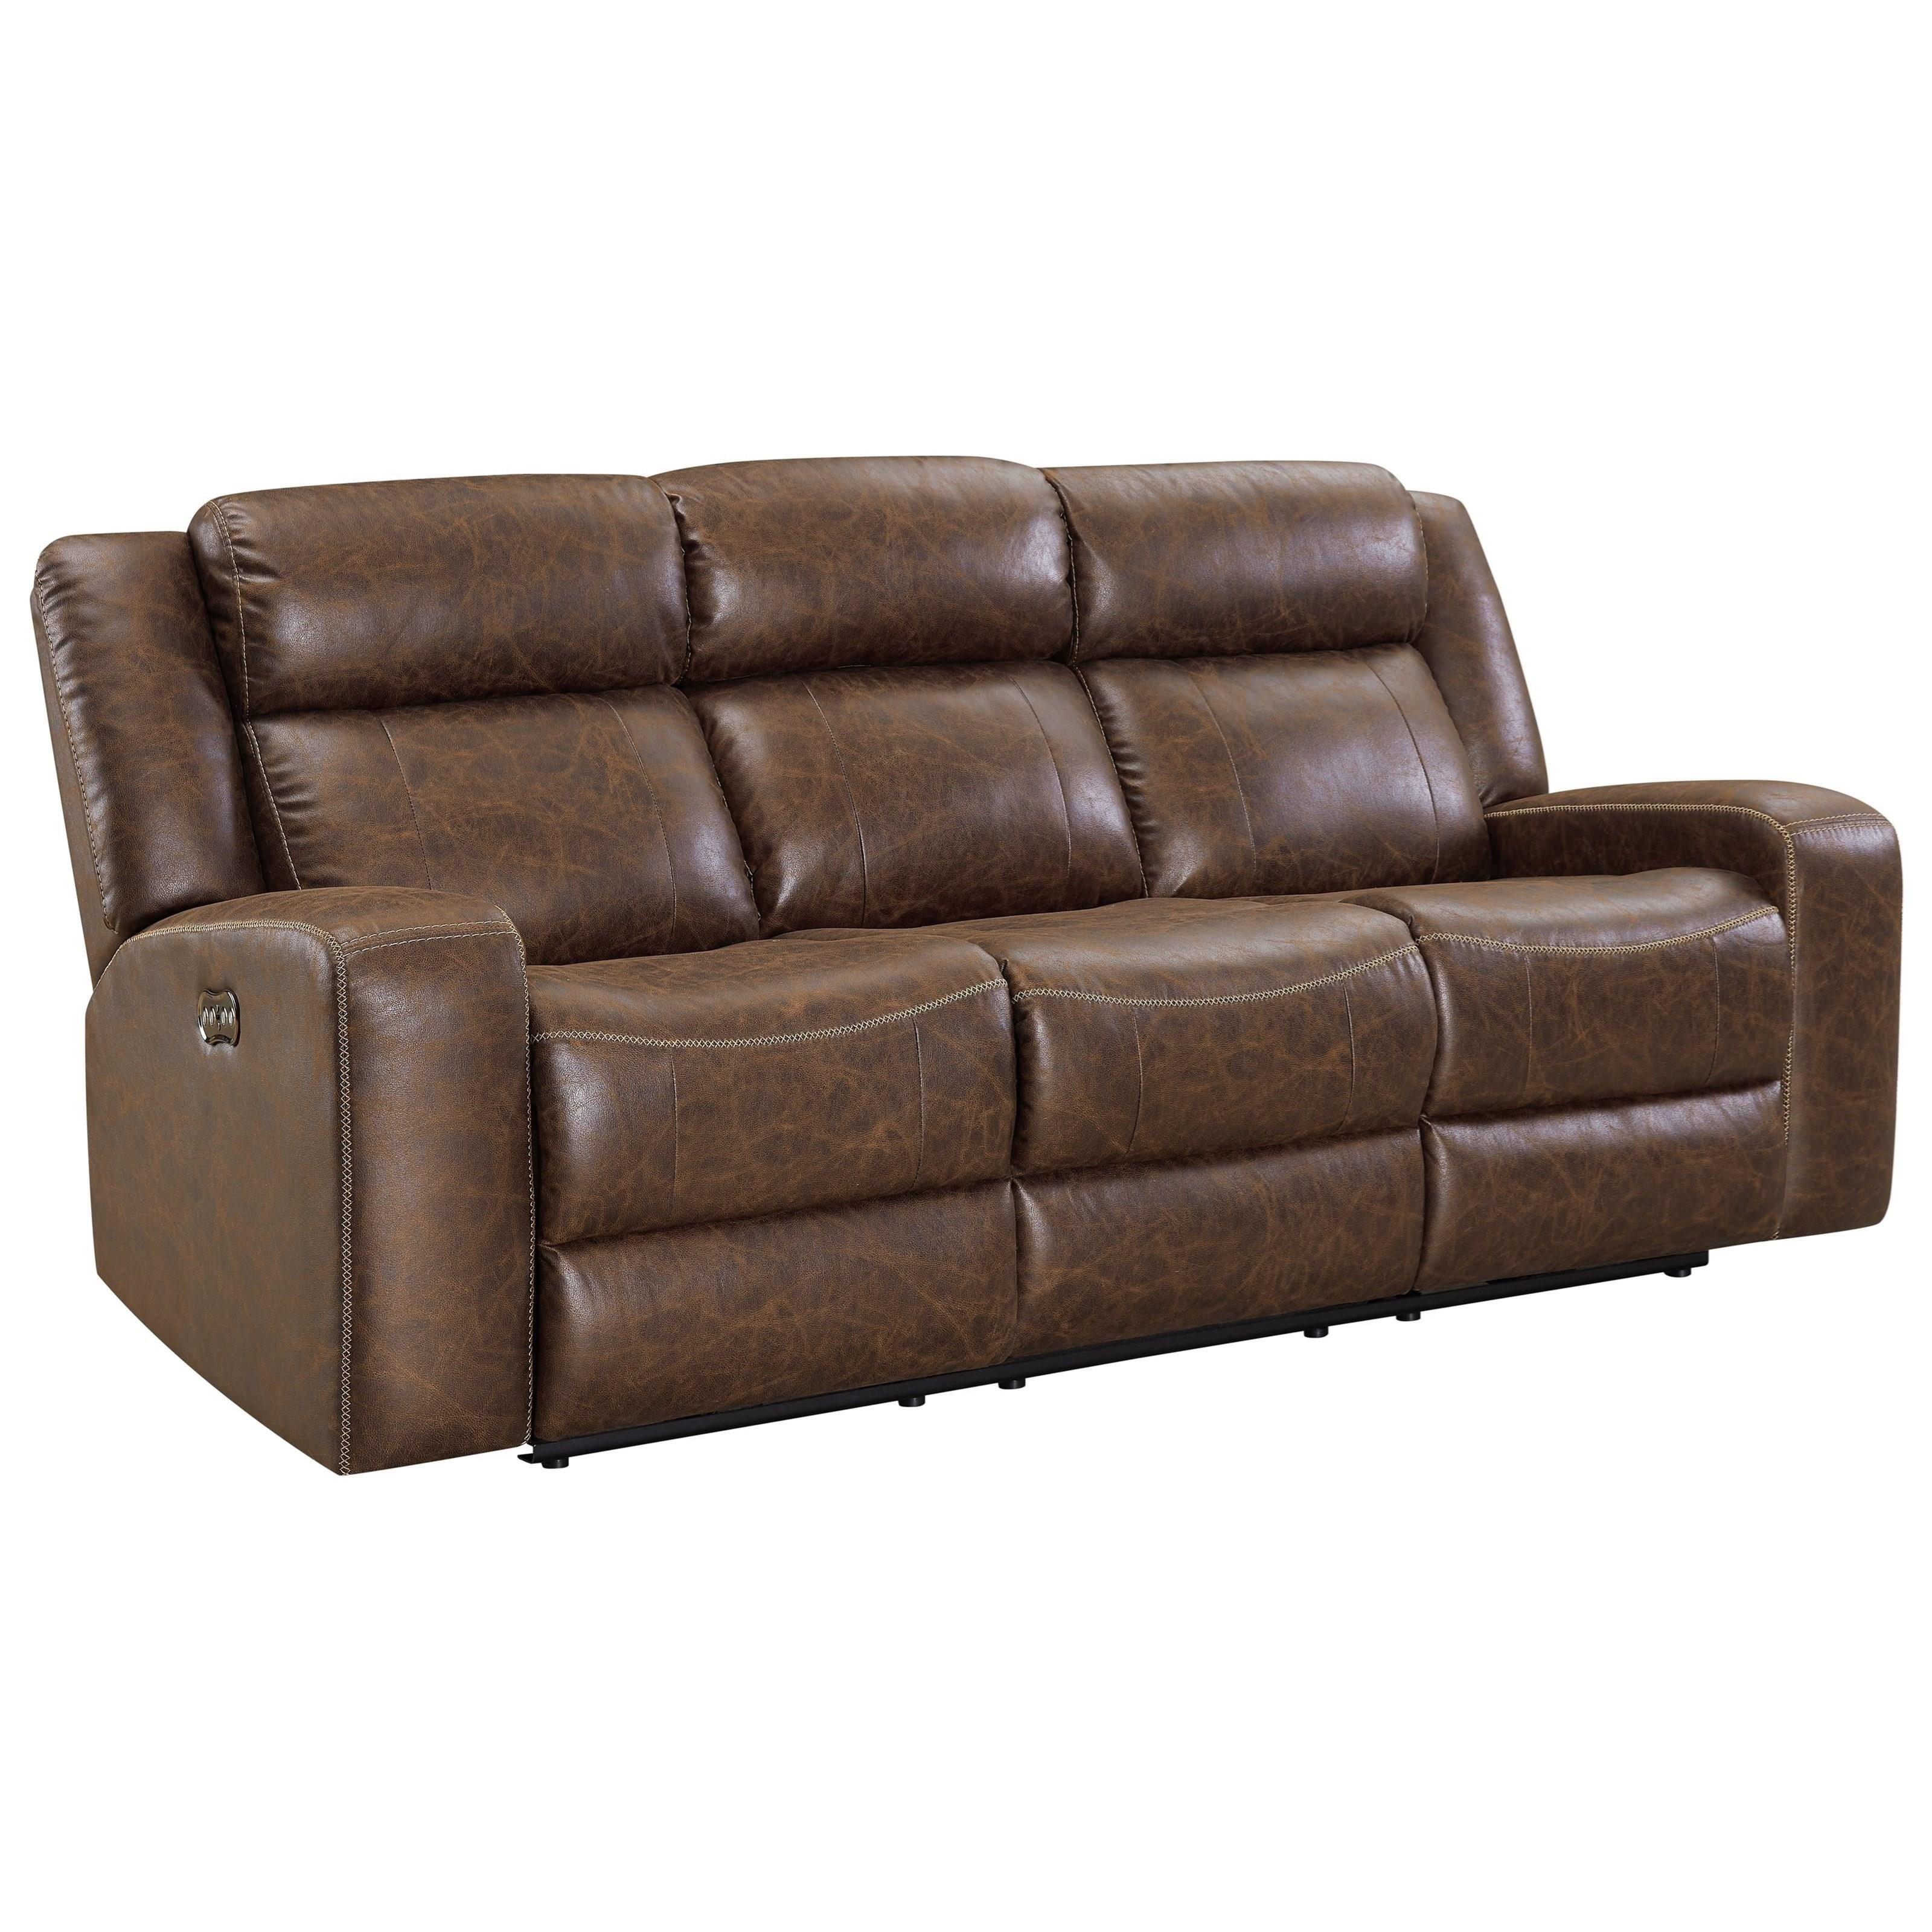 Atticus Dual Recliner Sofa by New Classic at Carolina Direct